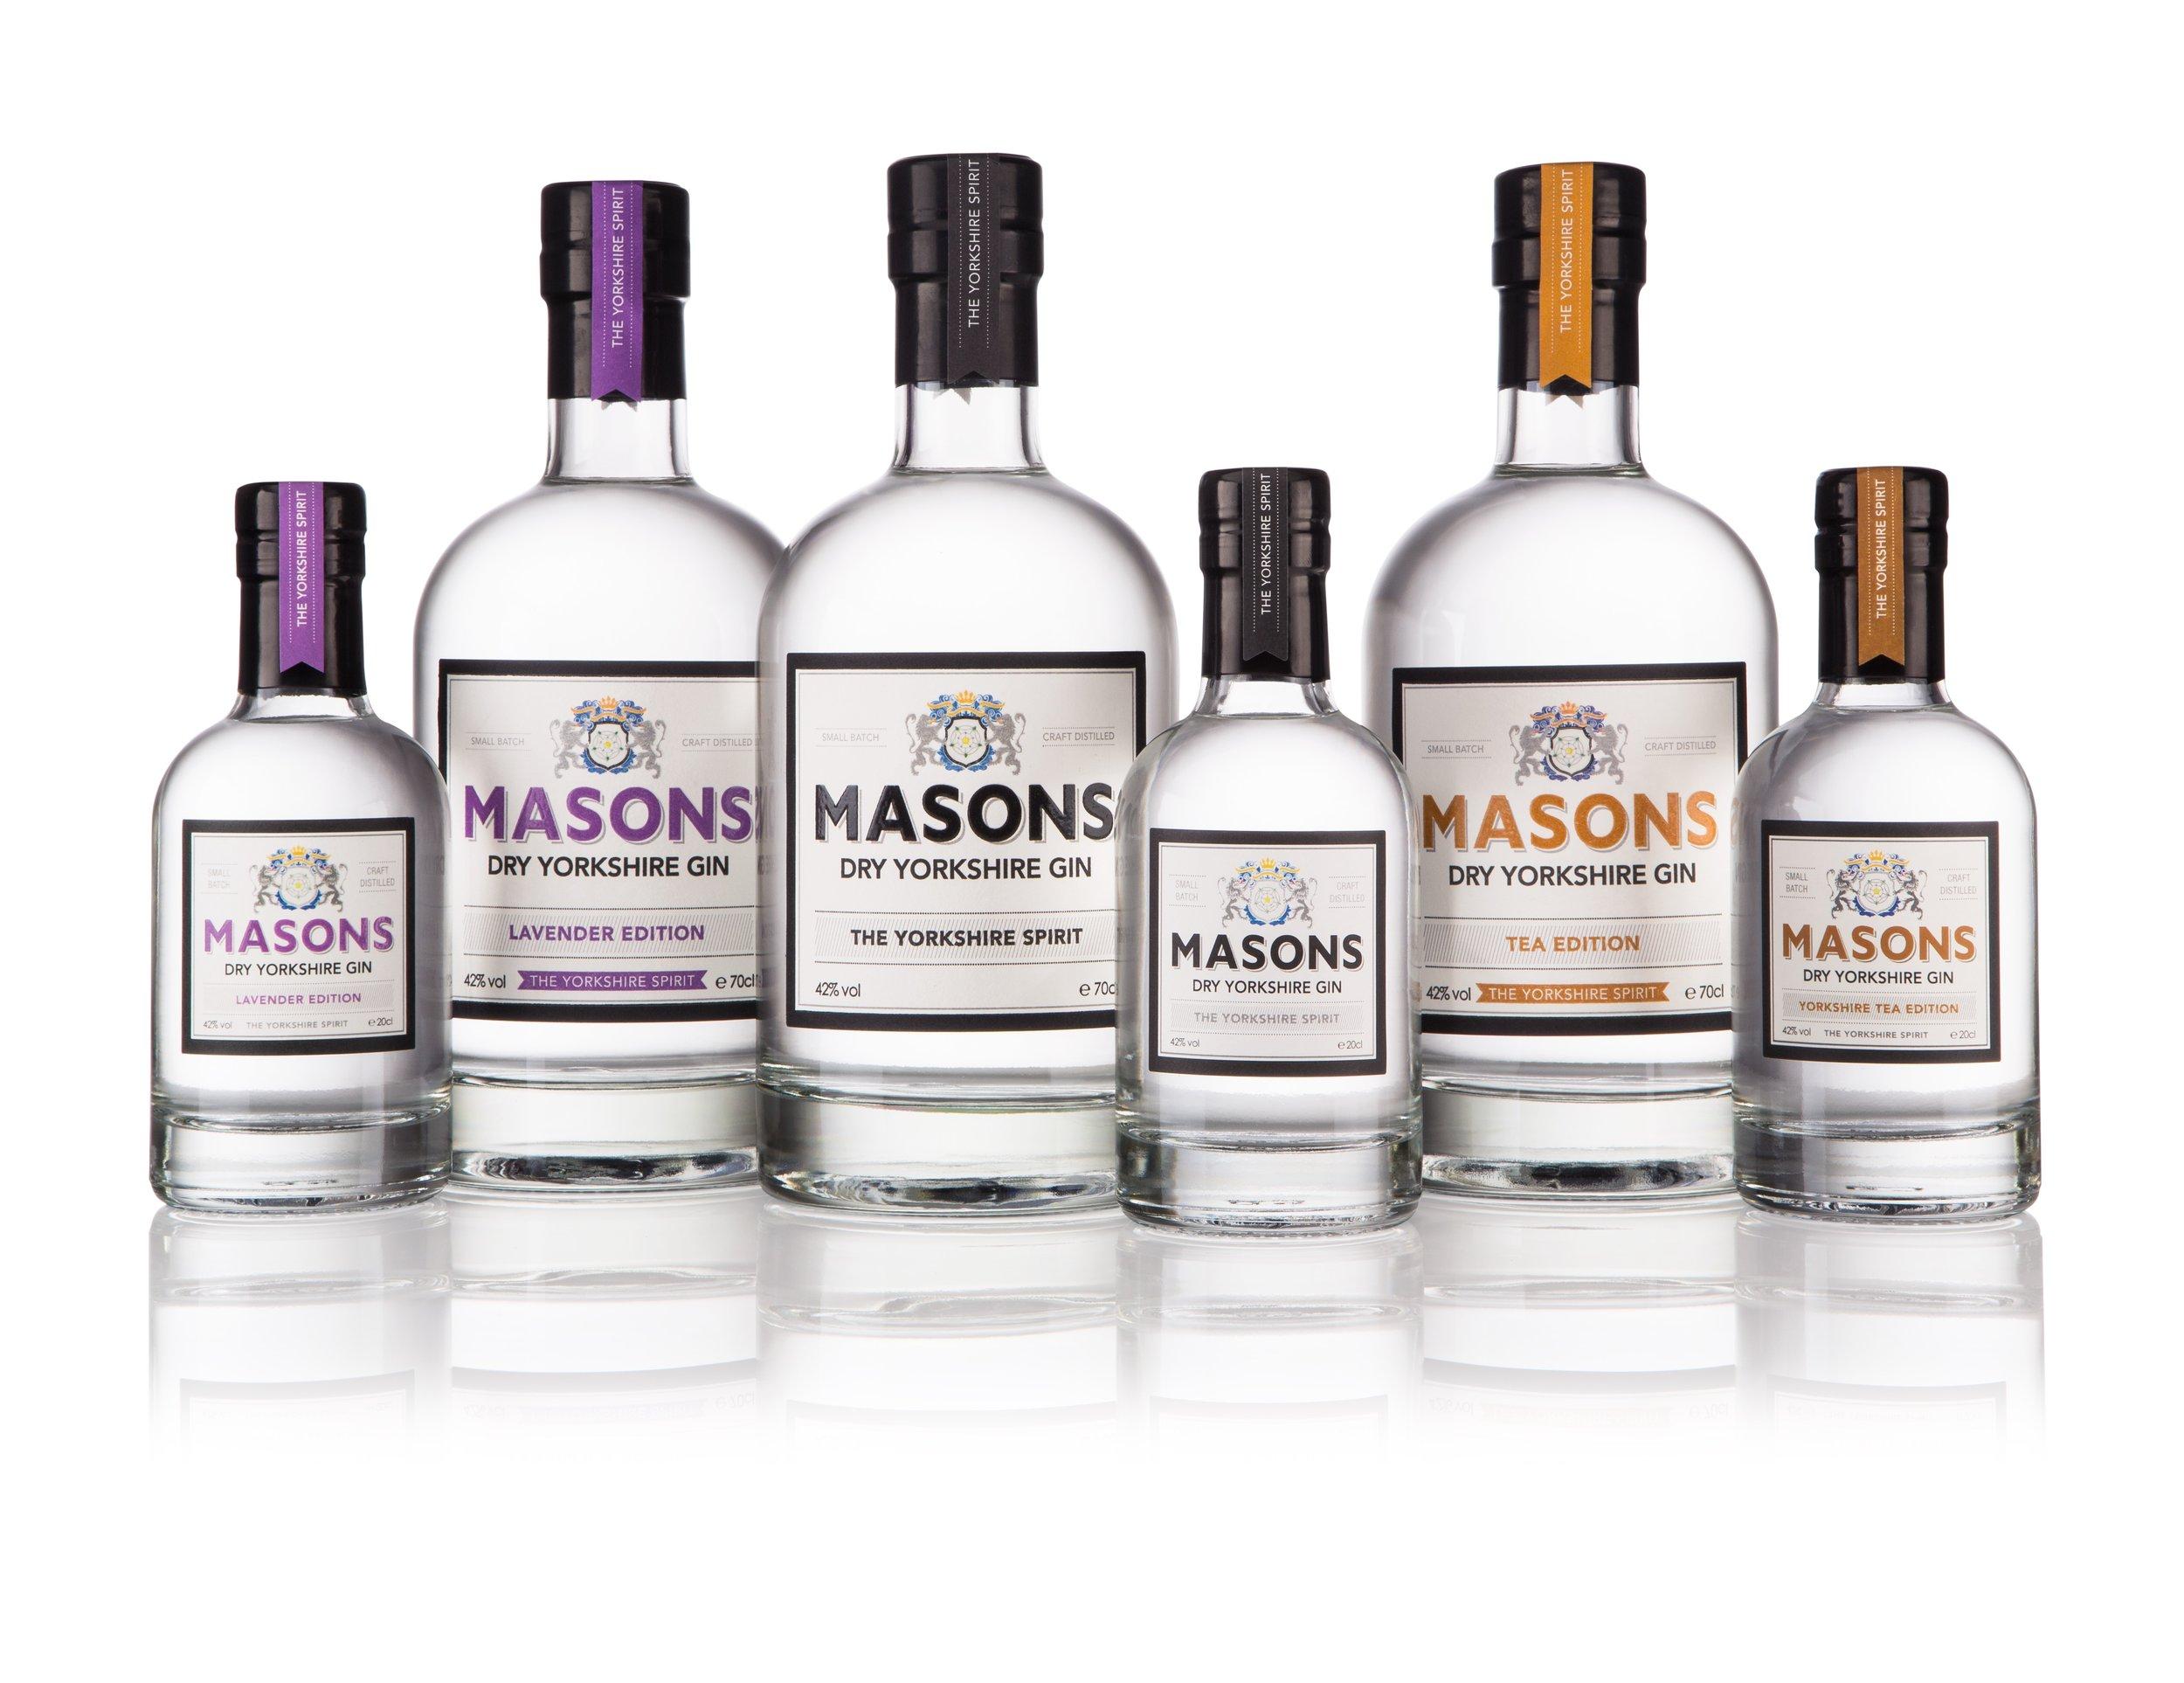 Masons_gin_range copy - more sensible size.jpg